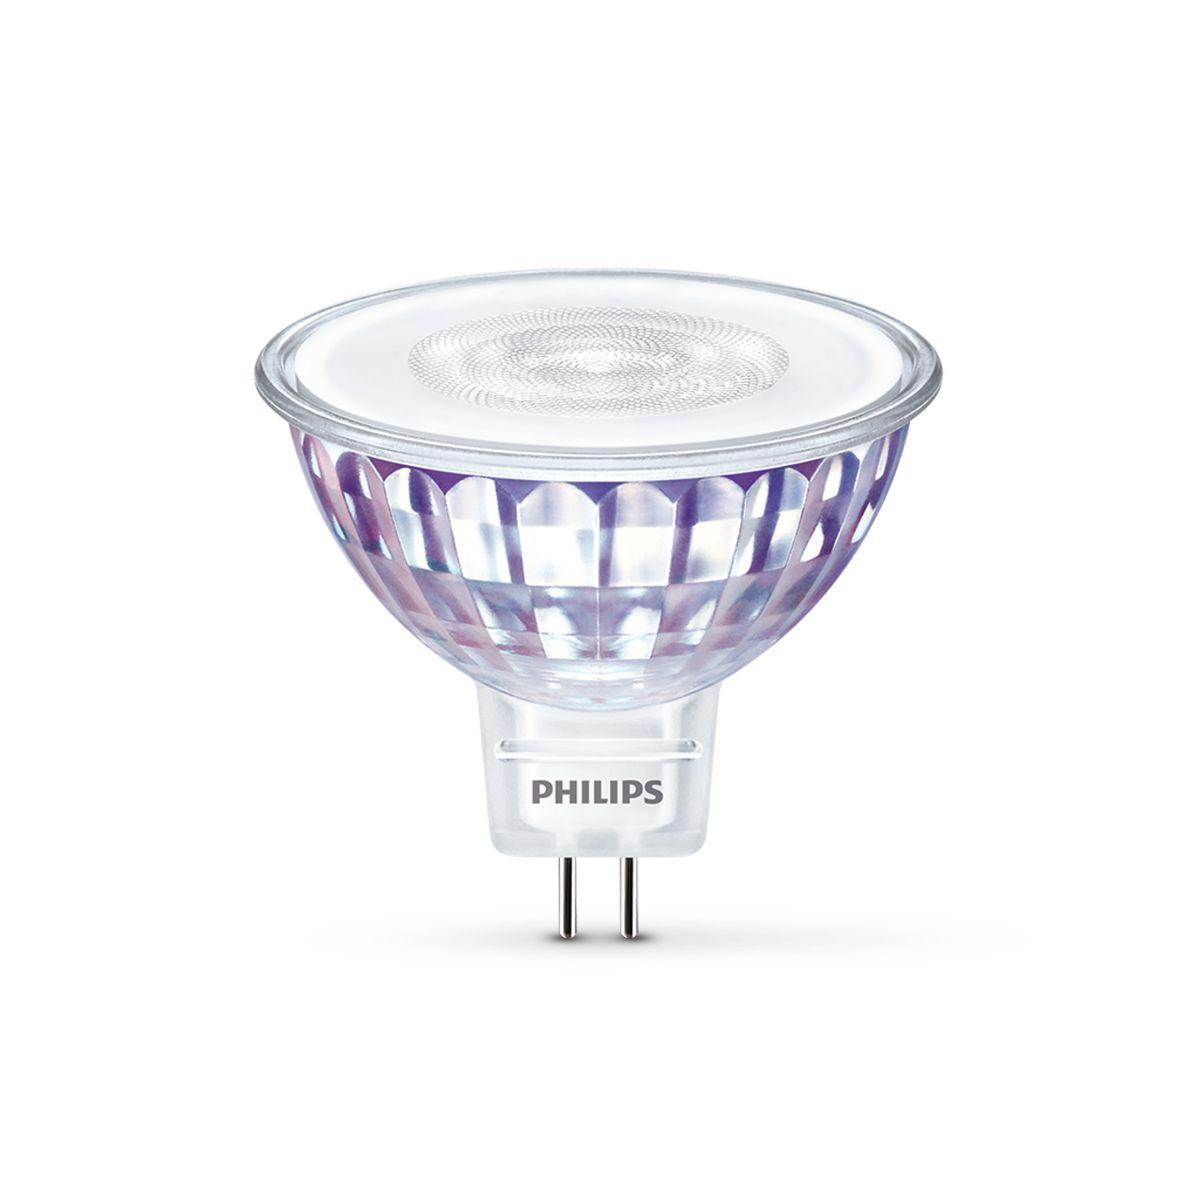 Philips Niedervolt LED Spot MASTER MR16 8W GU5.3 827 24° DIM 50W